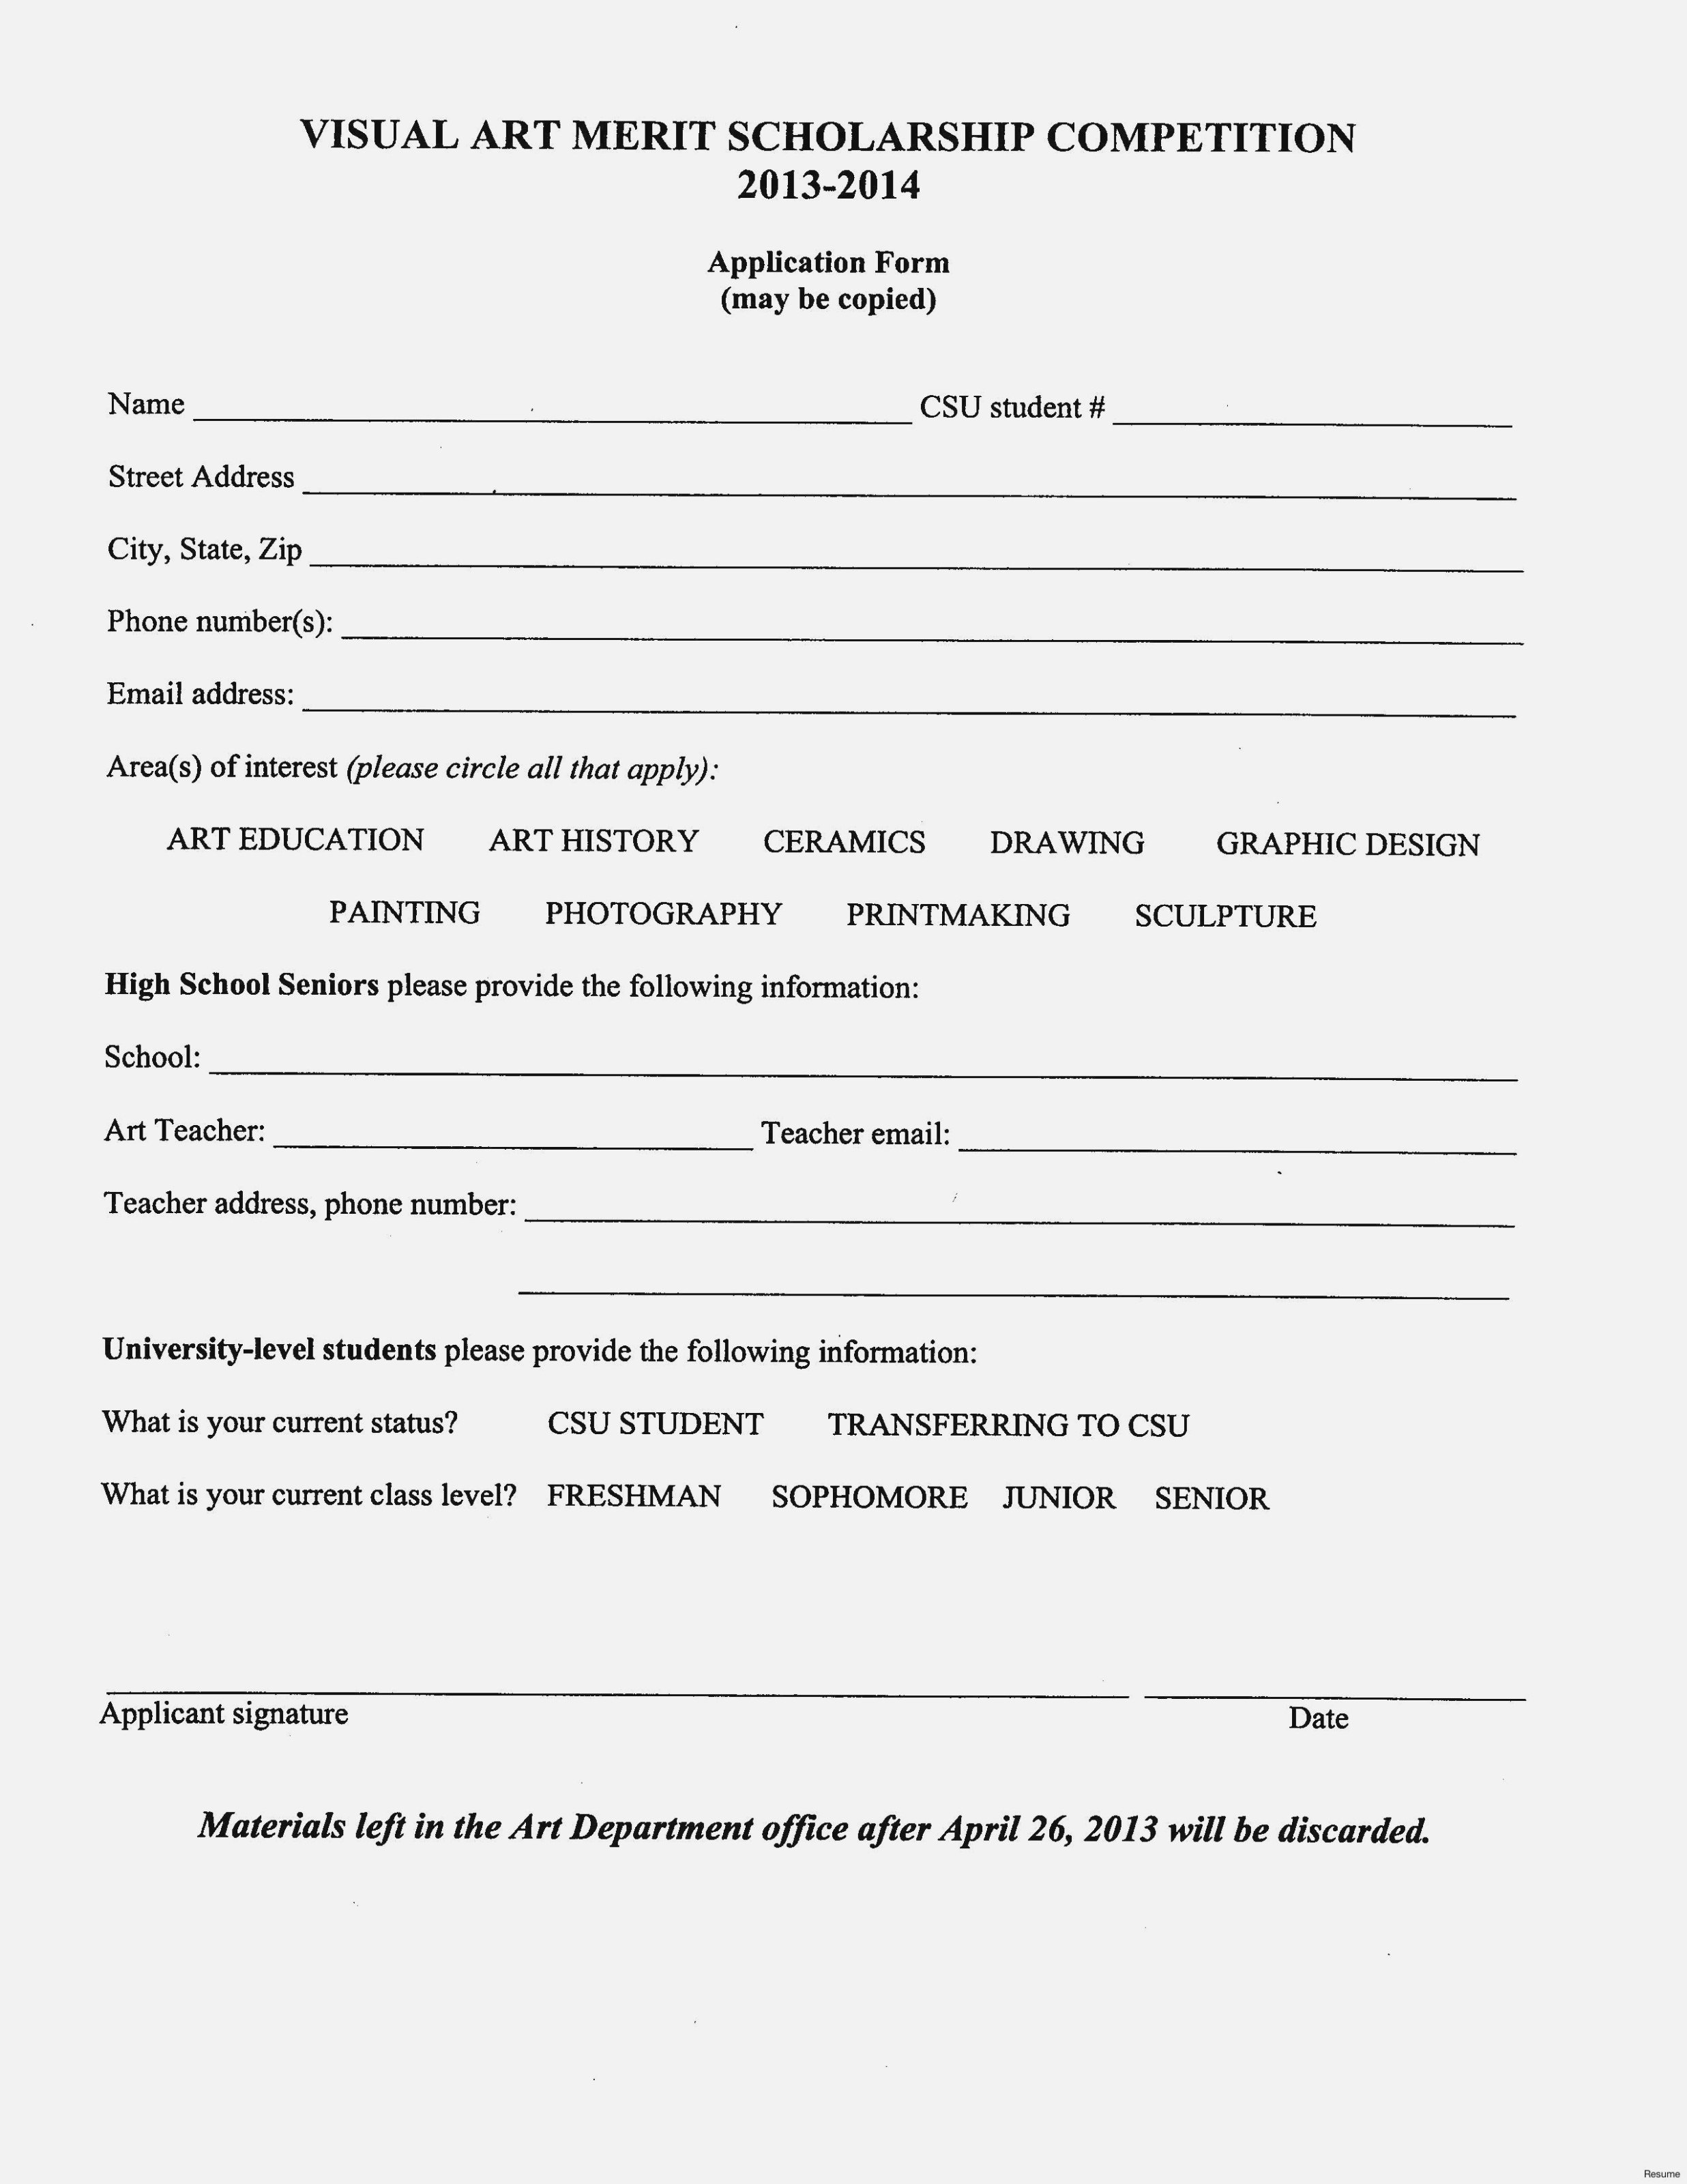 Free Printable Caregiver Forms New 15 Fresh Free Caregiver Invoice - Free Printable Caregiver Forms